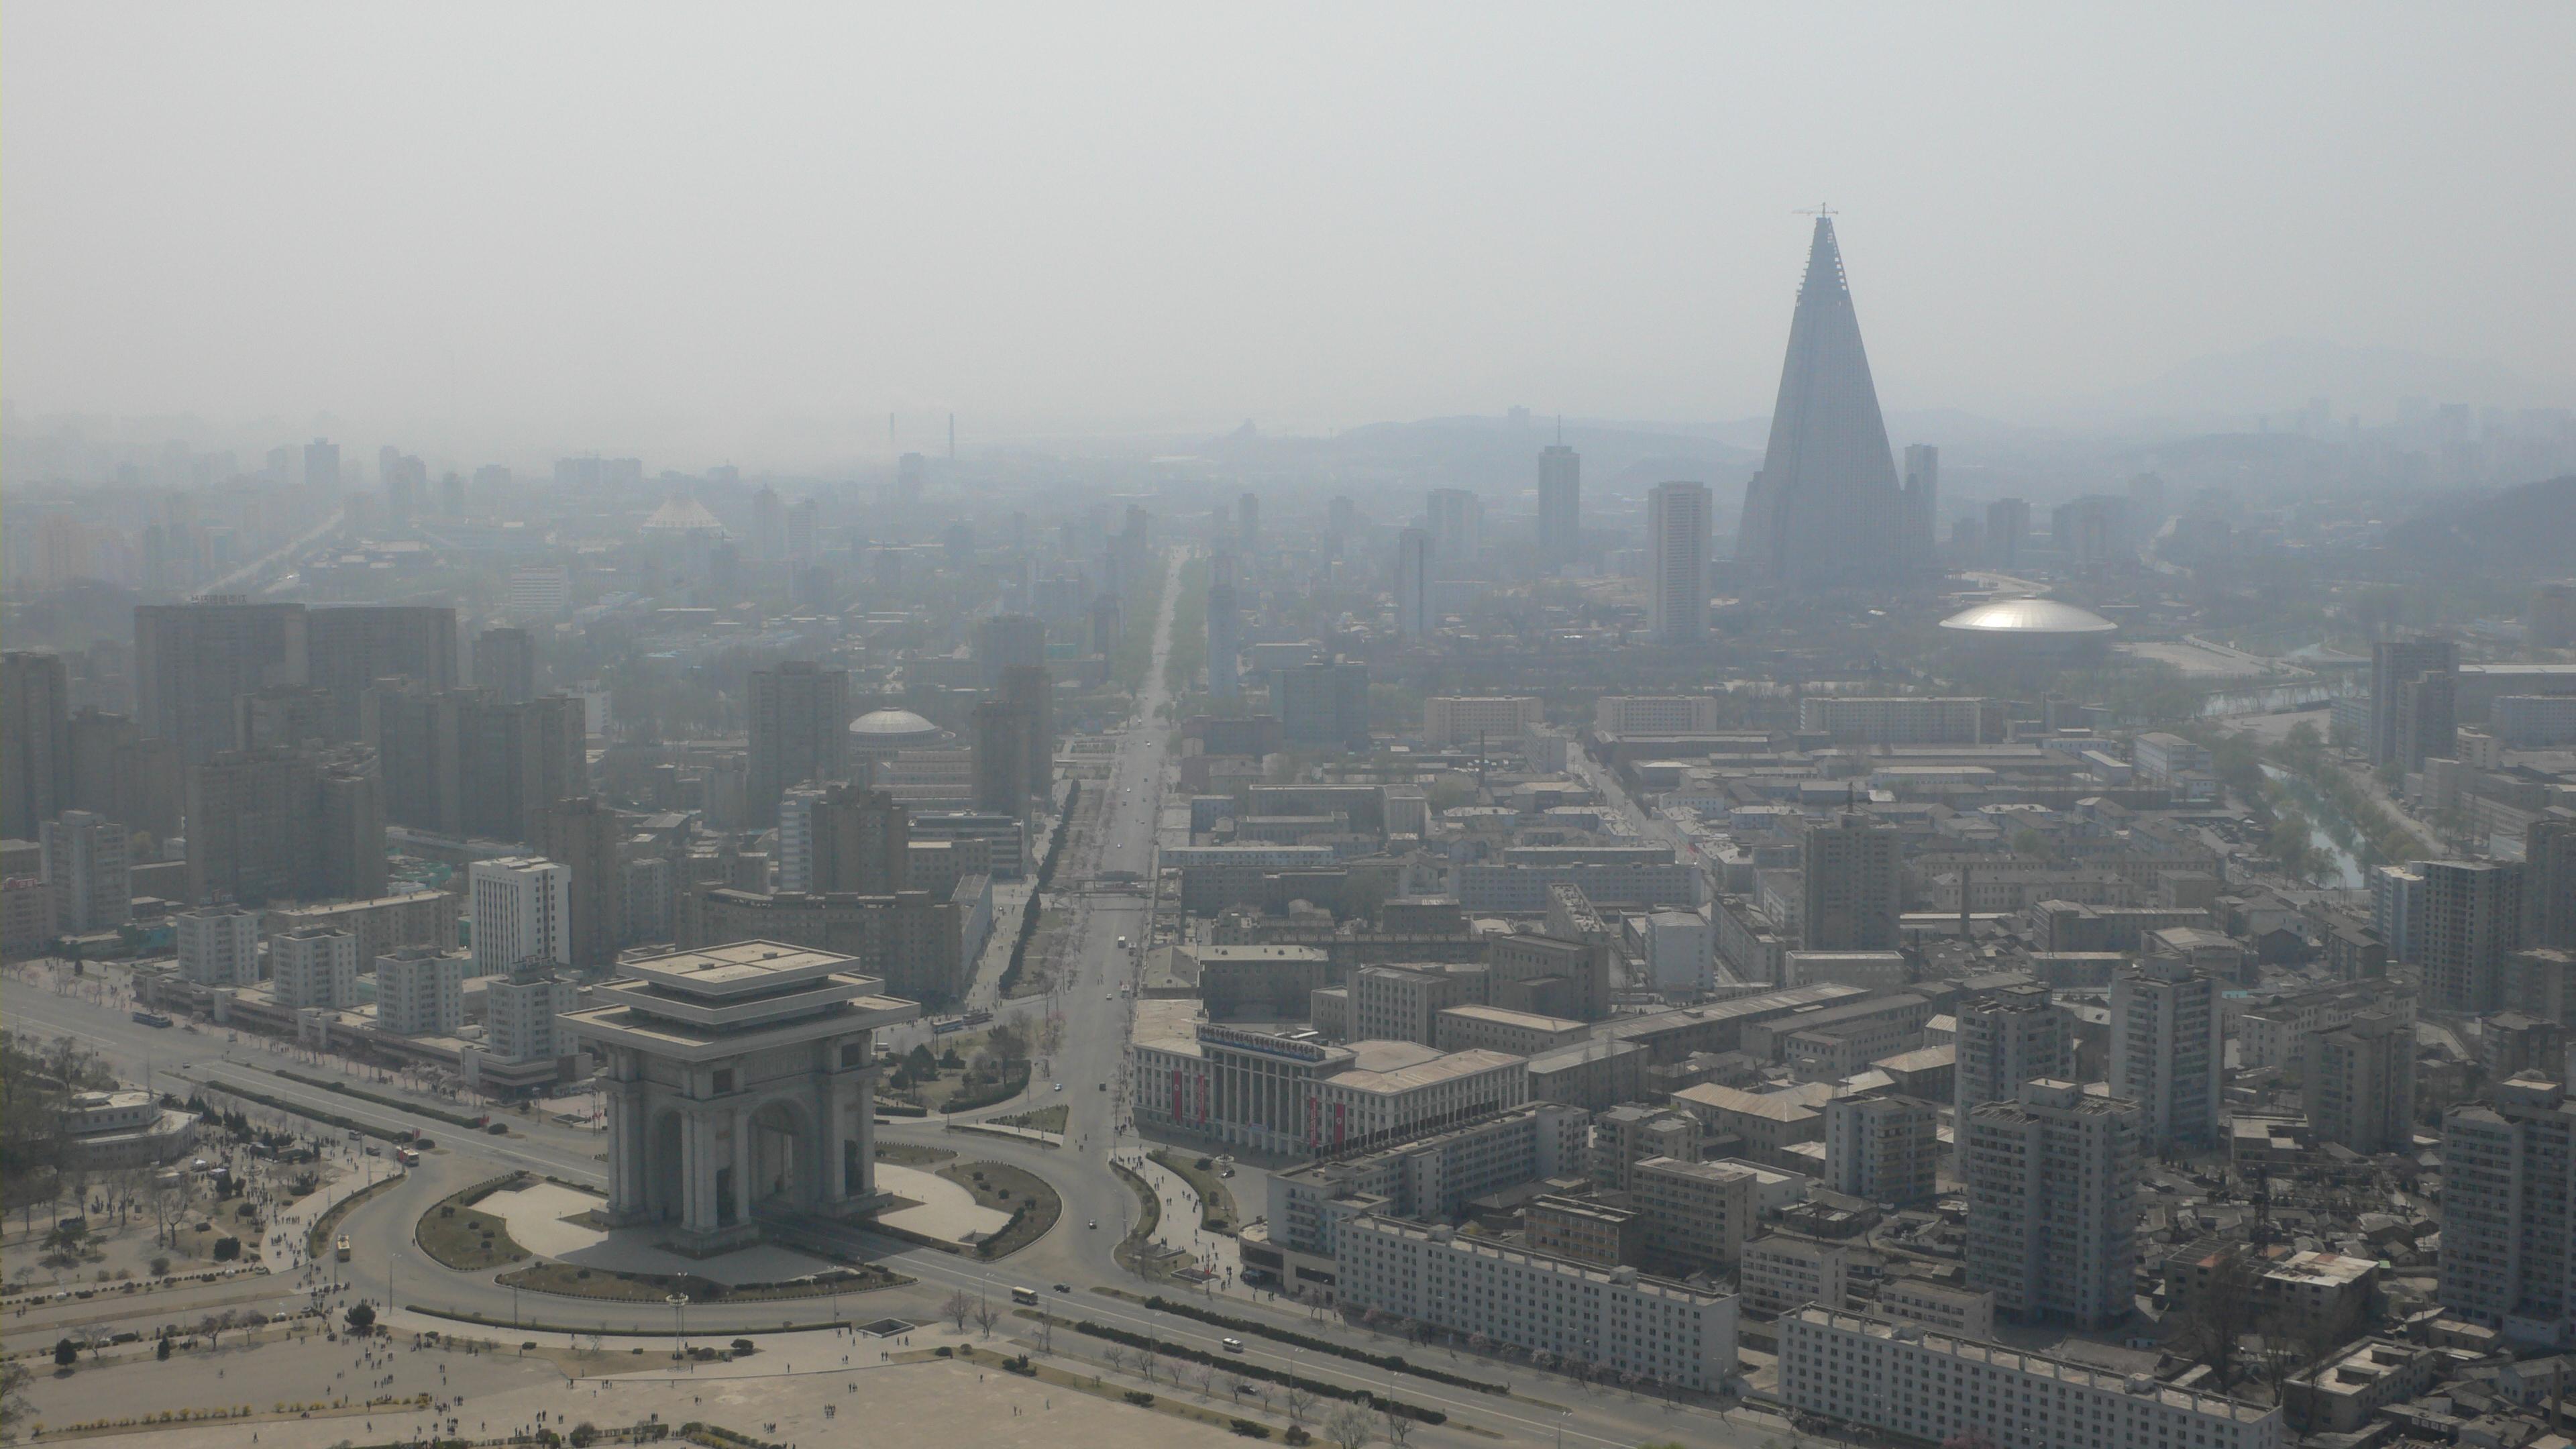 Panorama Pjongjang 2012 rok, źródło: koryogroup.com 2012 rok